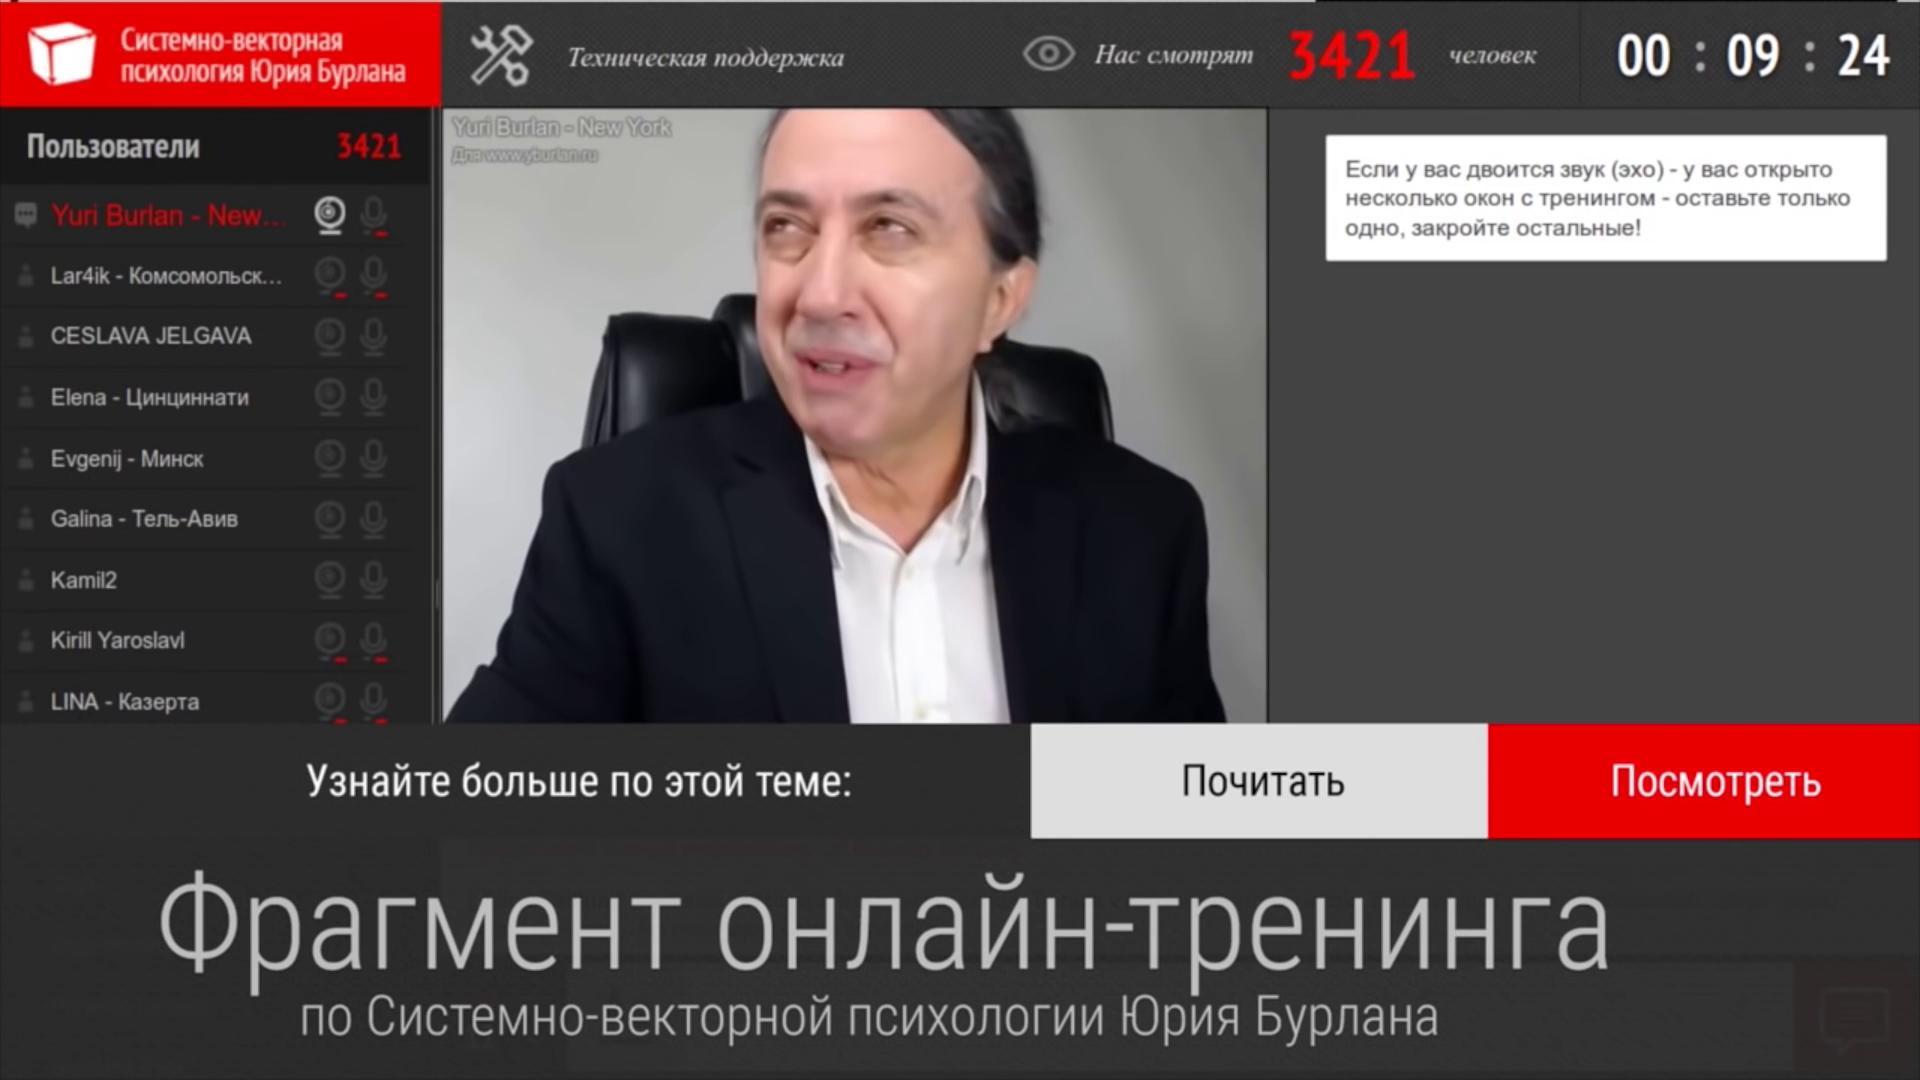 Г.м.логвиненко декоративная композиция читать онлайн